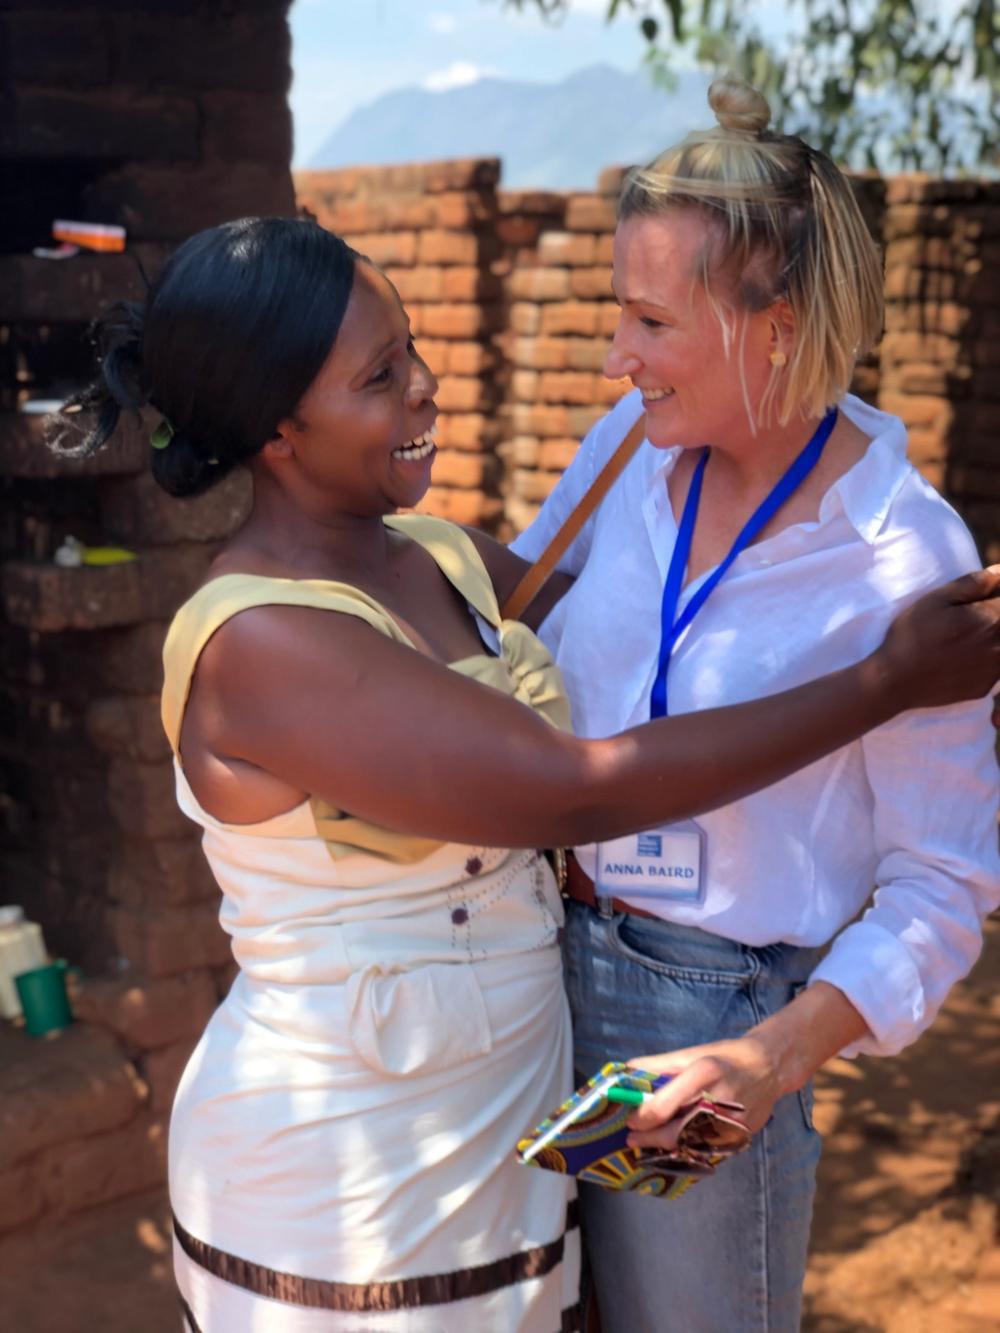 Bared_Footwear_The_Hunger_Project_Malawi_Anna_Baird_Jesse_Women